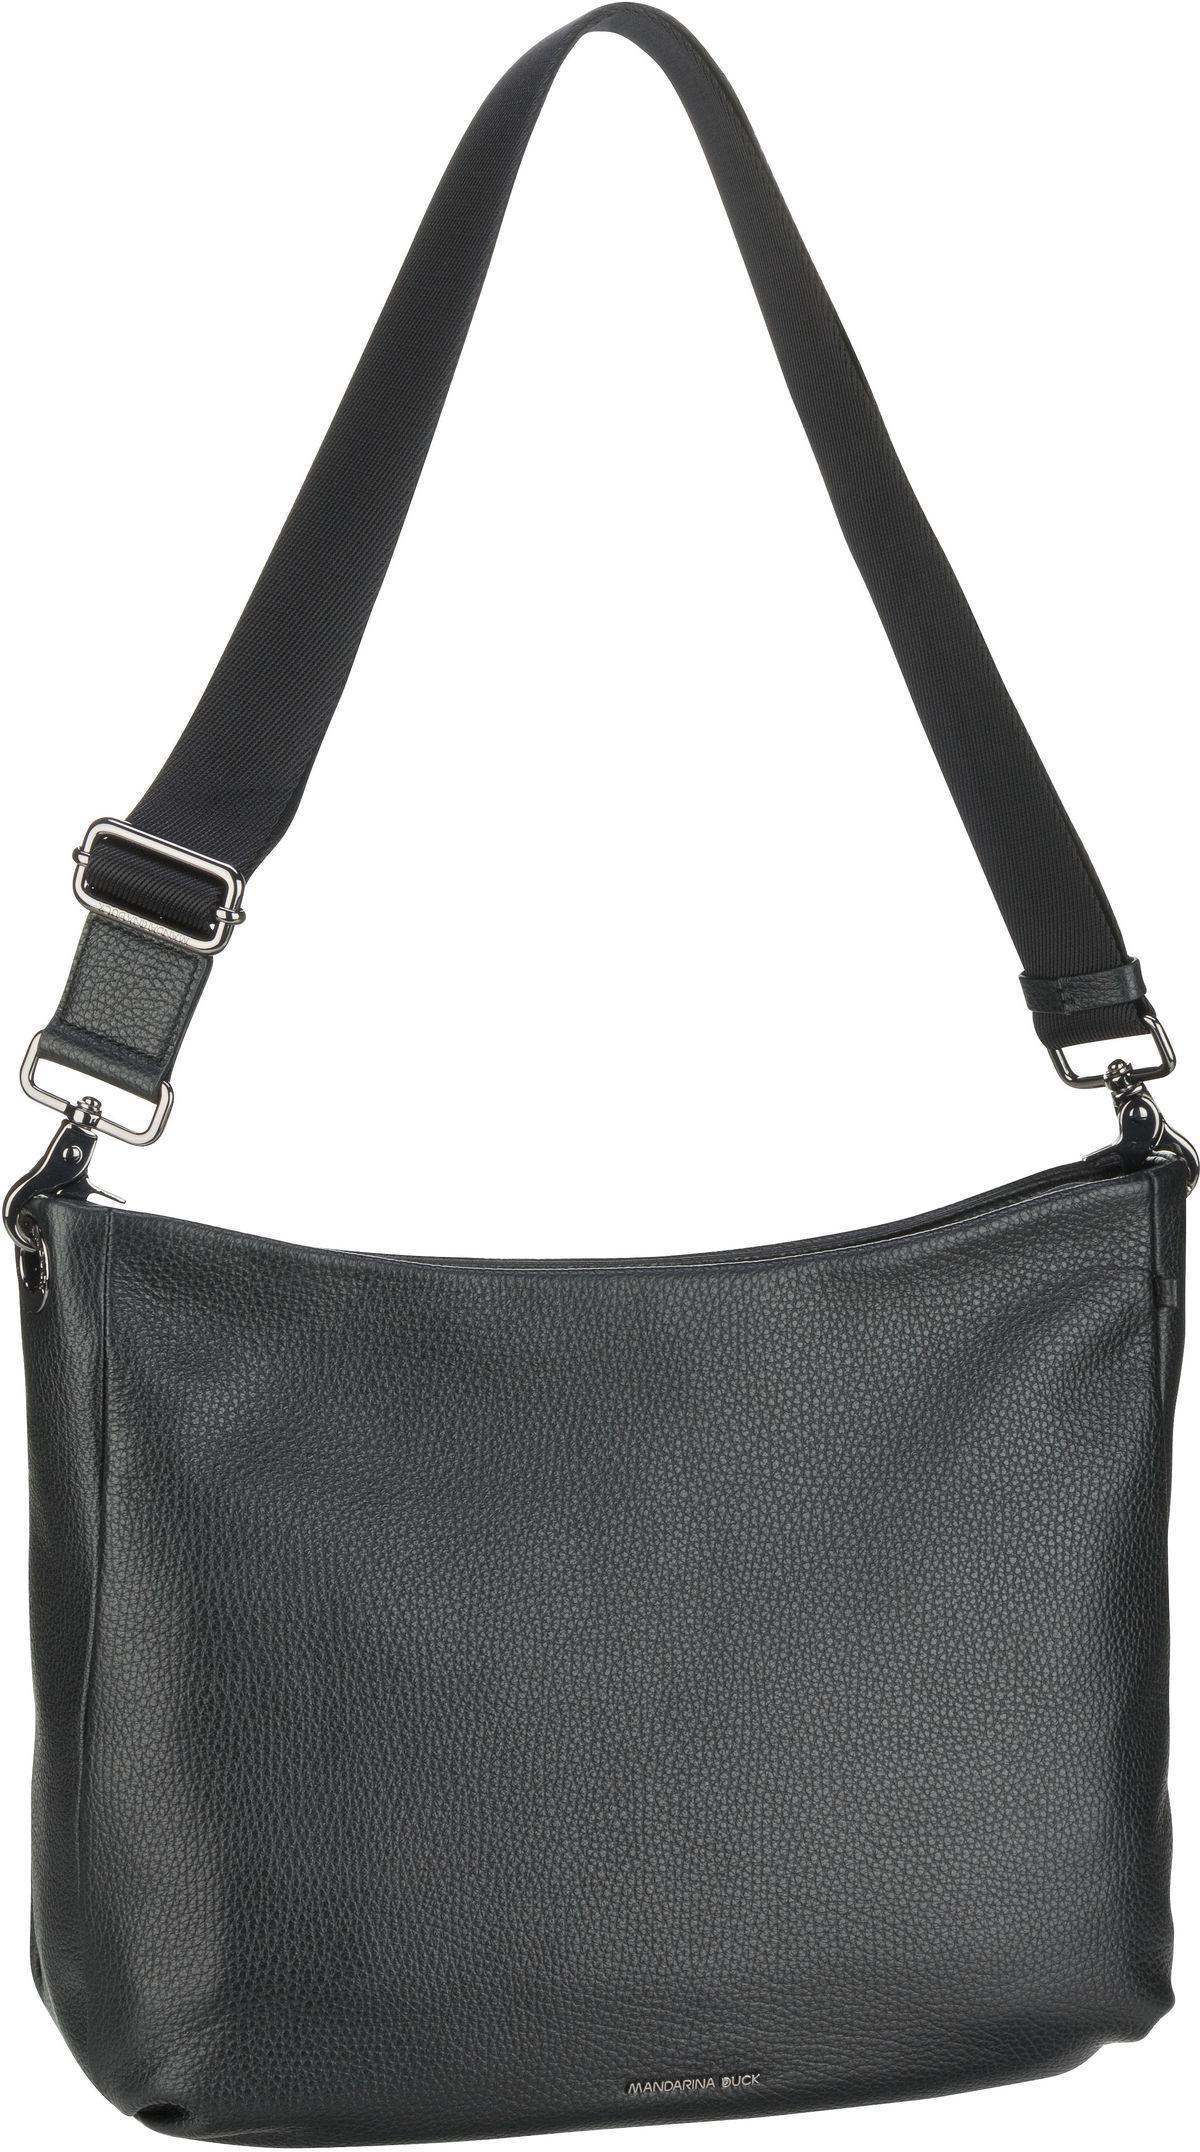 mandarina duck -  Handtasche Mellow Leather Hobo FZT34 Nero